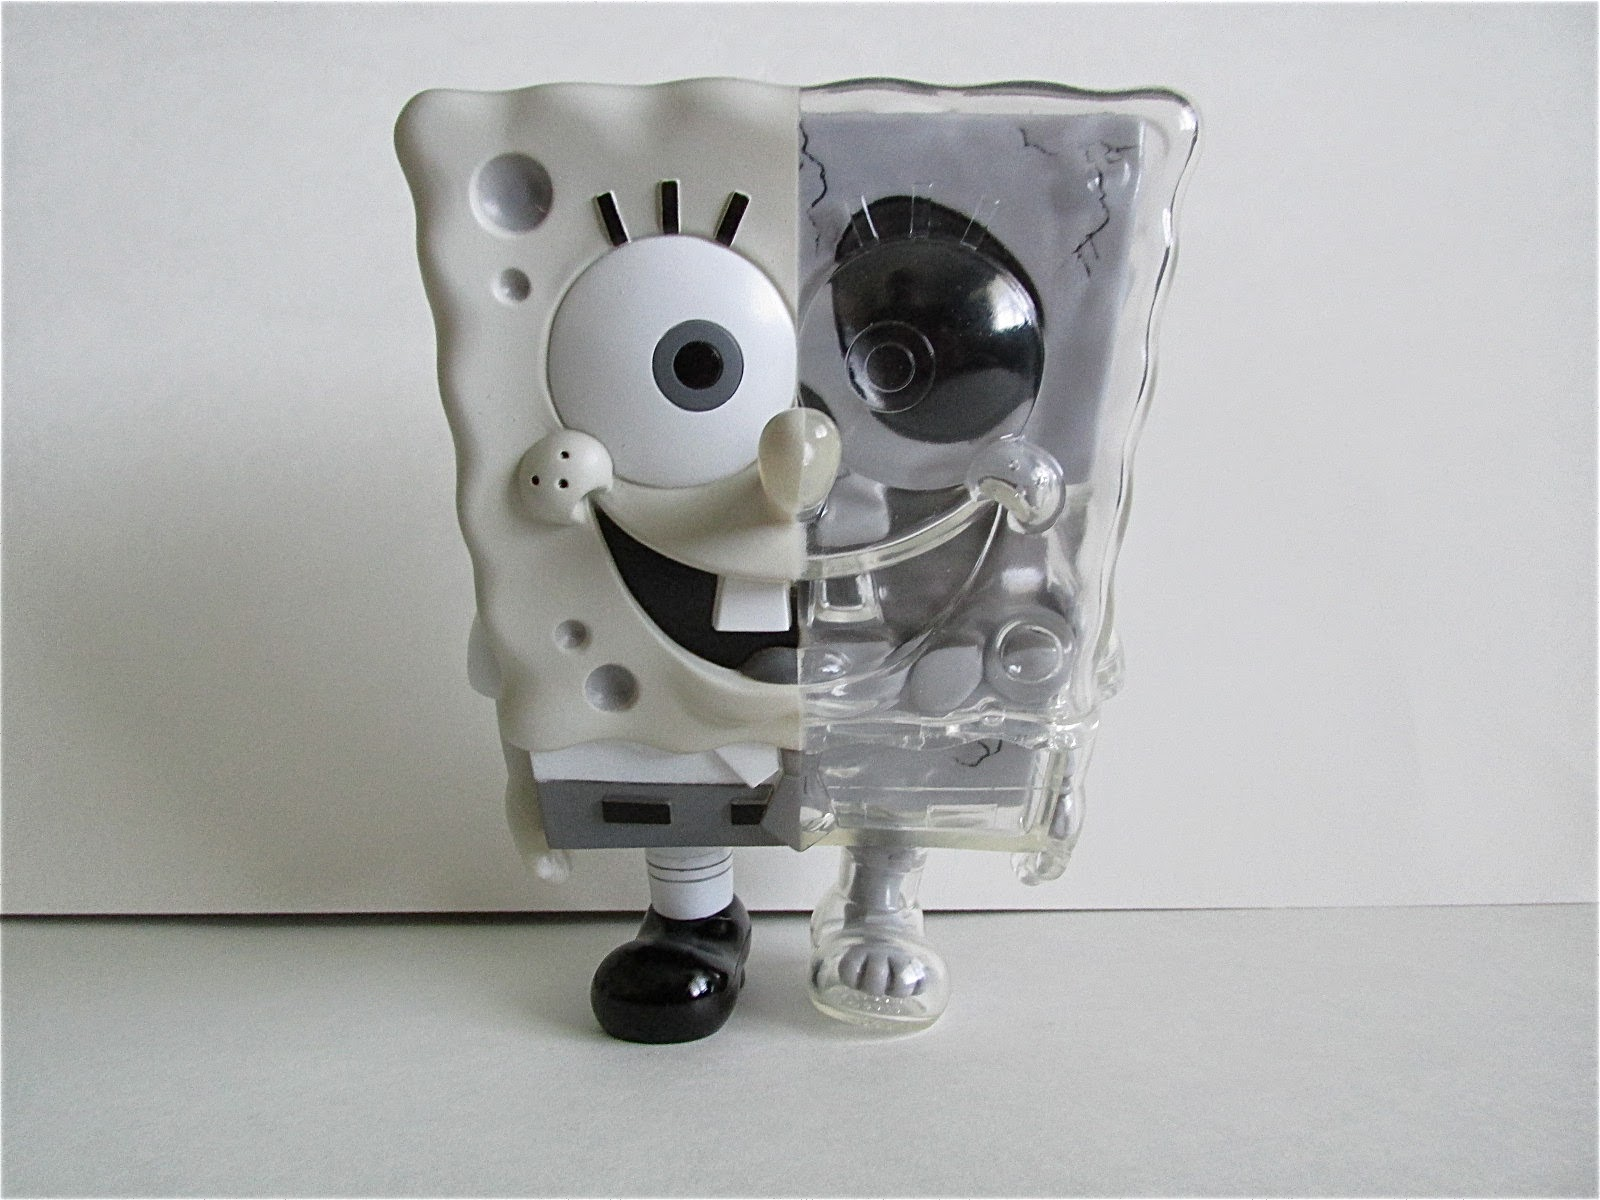 spongebob squarepants x secret base black and white edition toy